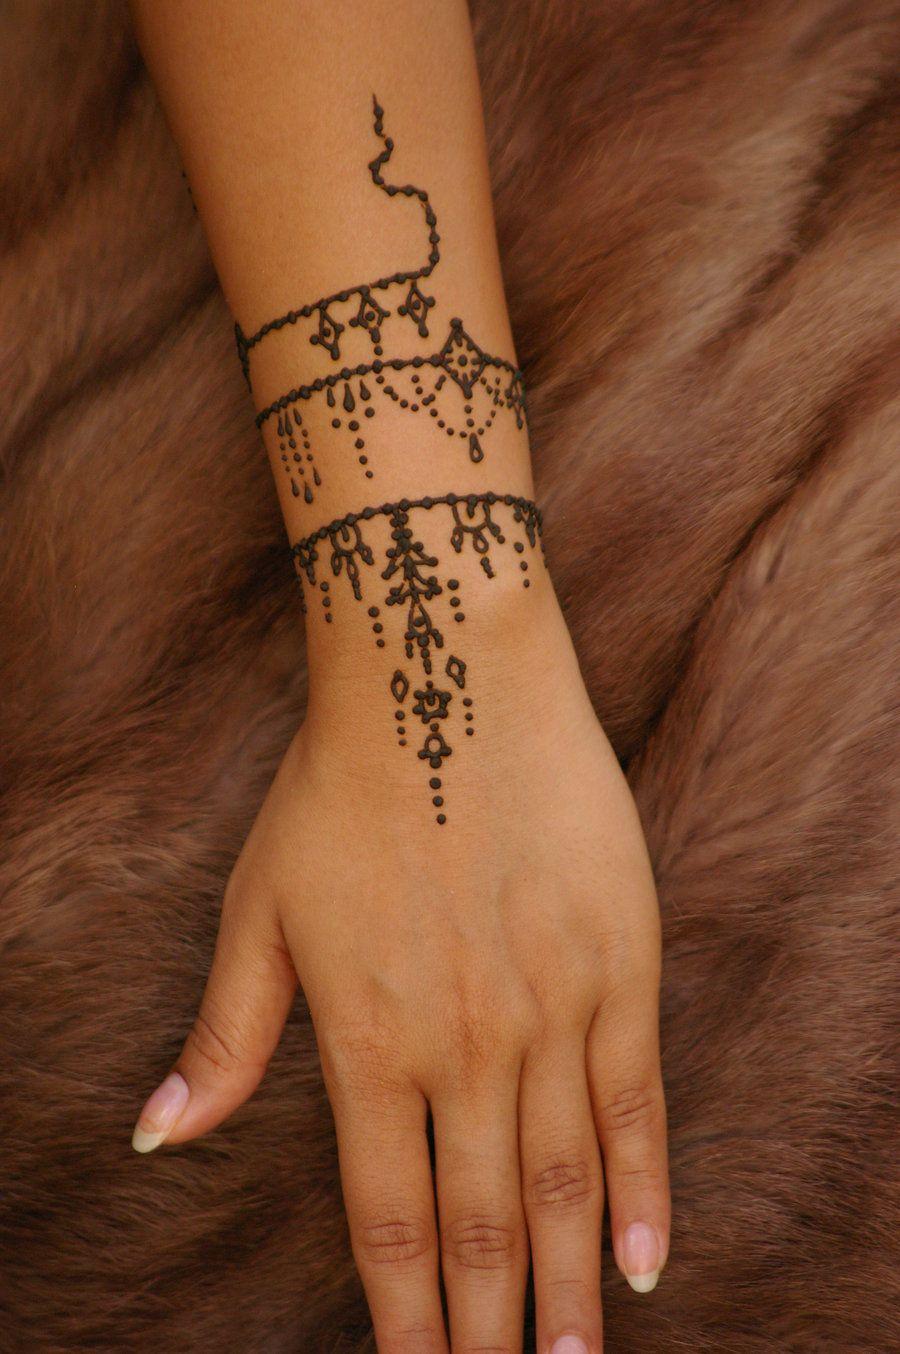 Stunning Henna Mehndi Tattoo Scorpion Art Designs Picture For Hand